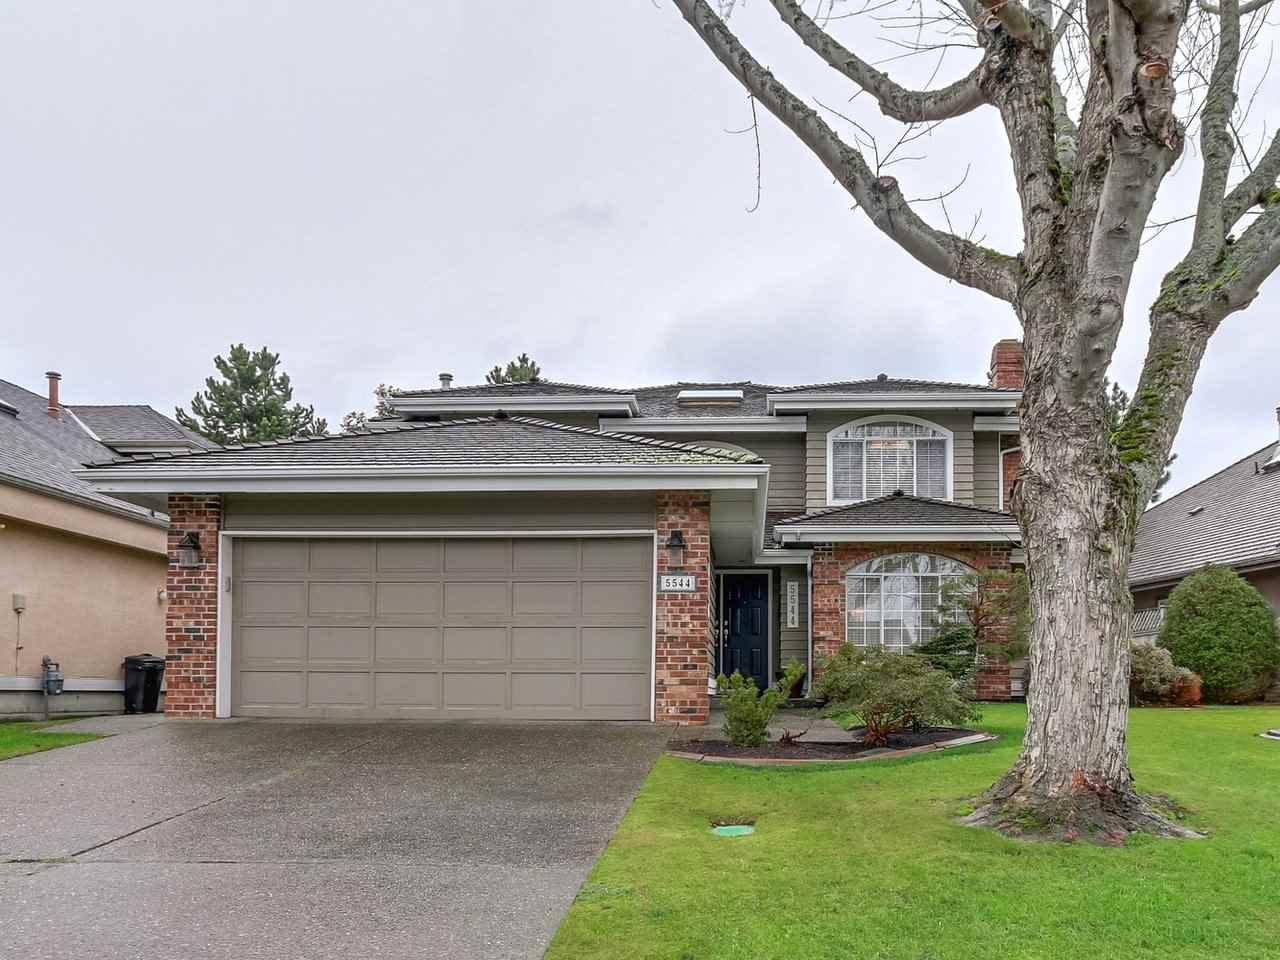 Main Photo: 5544 CORNWALL Drive in Richmond: Terra Nova House for sale : MLS®# R2235303